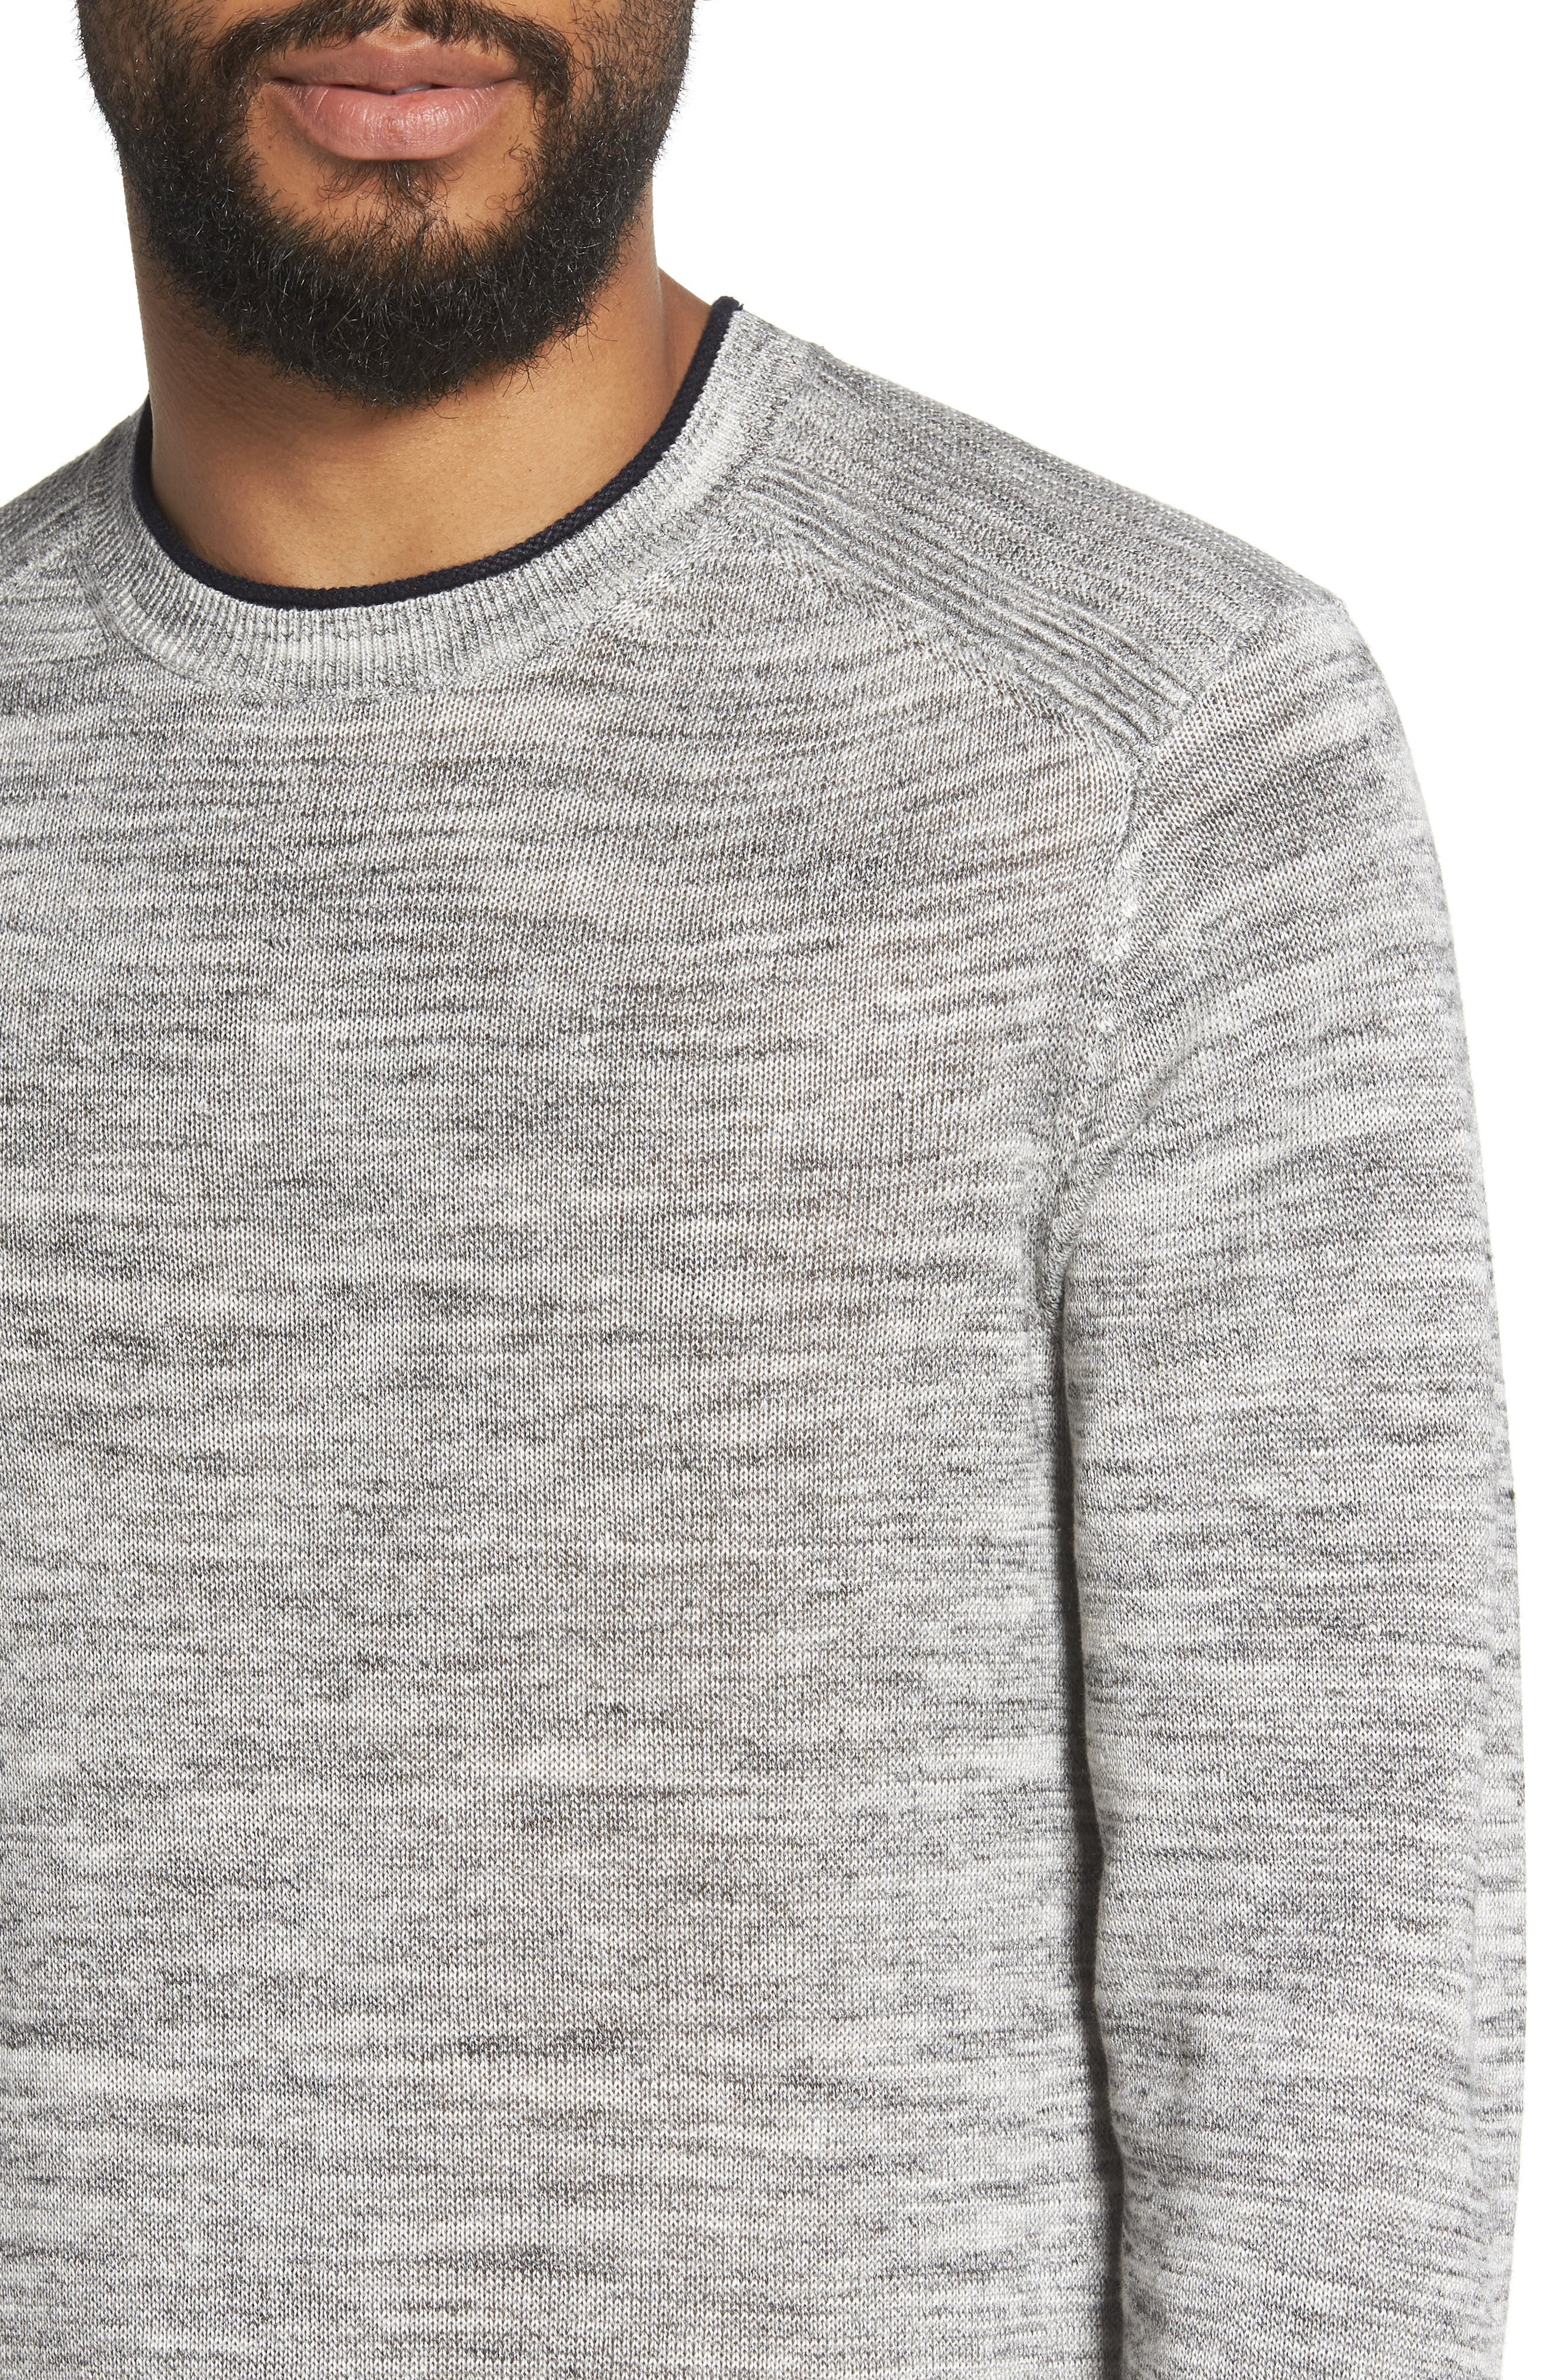 Inzone Crewneck Linen Blend Sweater,                             Alternate thumbnail 4, color,                             050